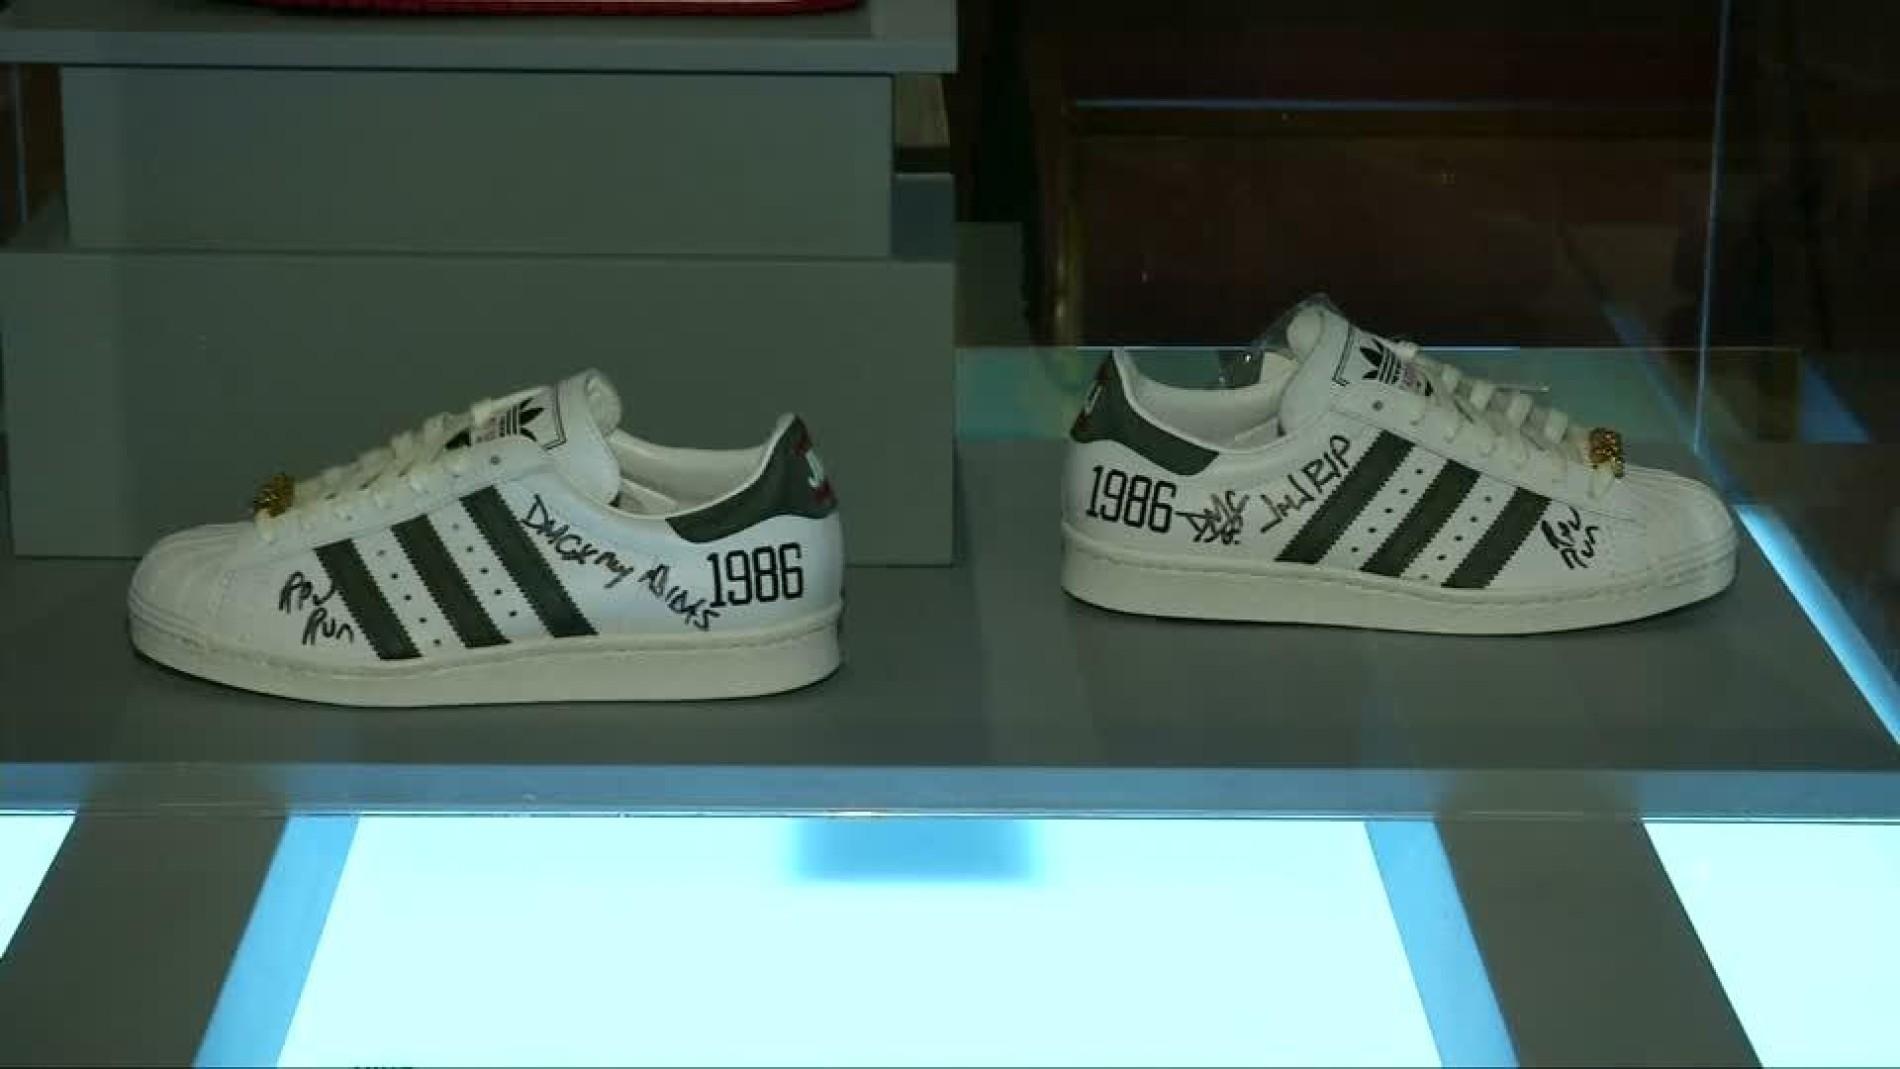 Turnschuh Ausstellung Brooklyn Museum Klassiker Sneaker Im Y5xqwd